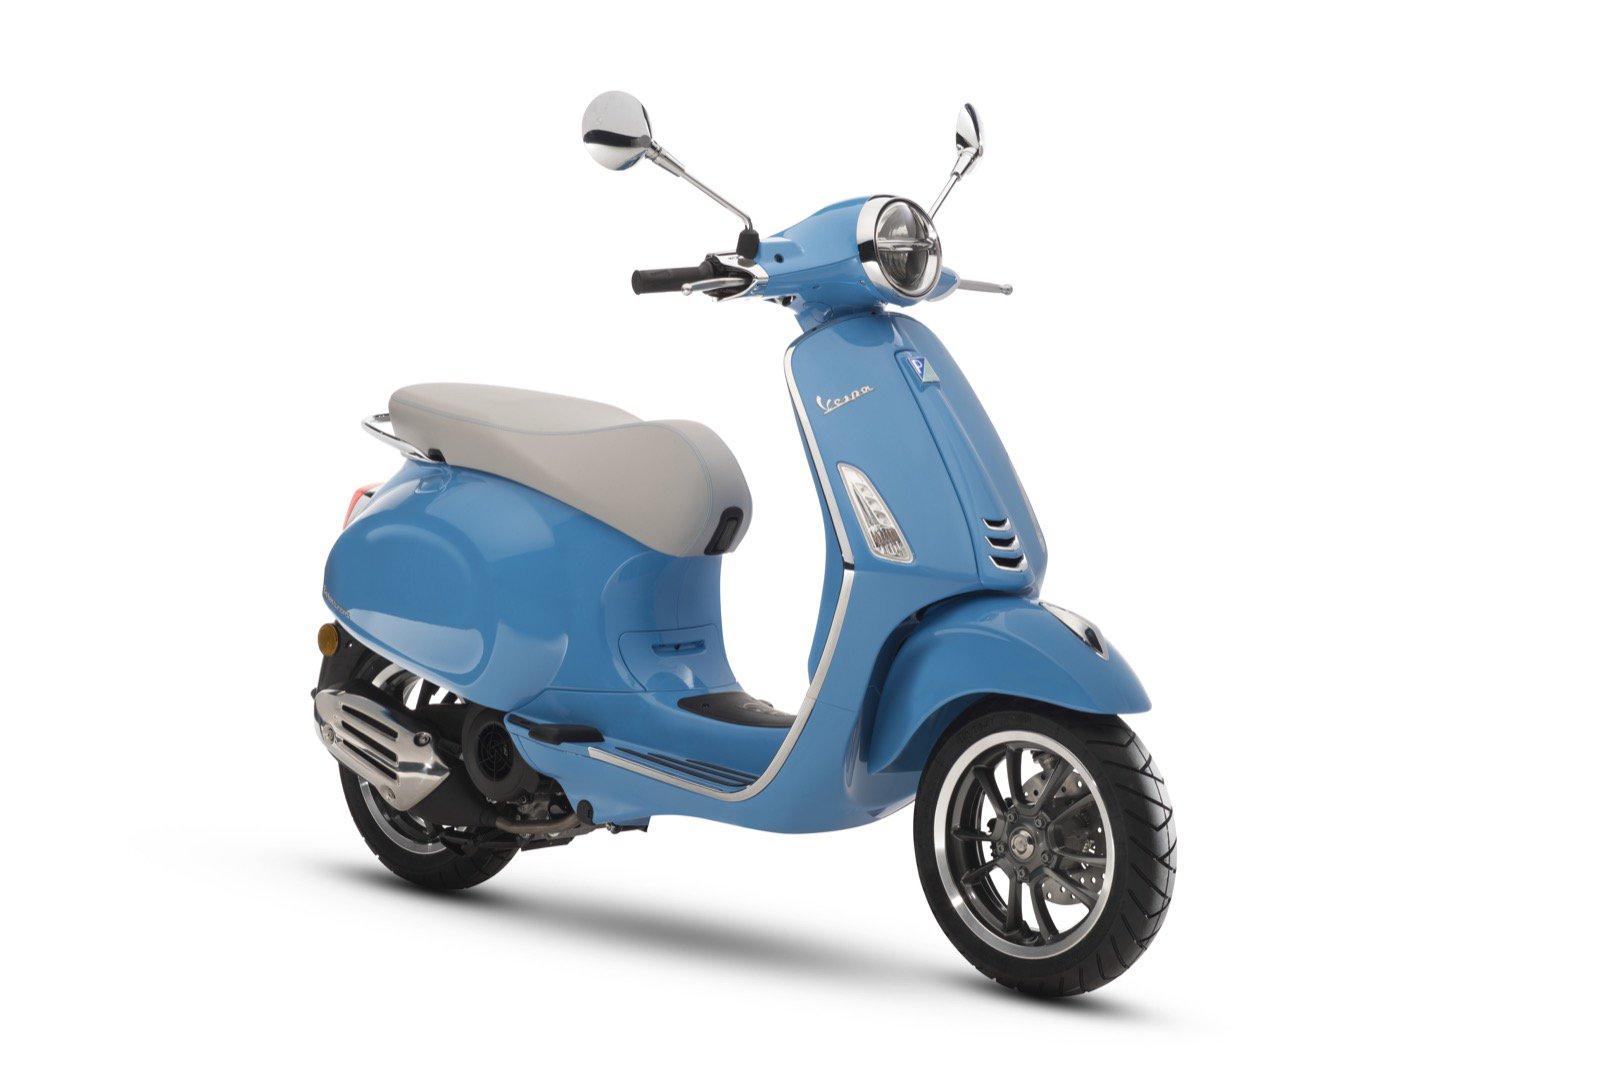 Defective Fuel Pump Triggers Piaggio and Vespa Recall - autoevolution